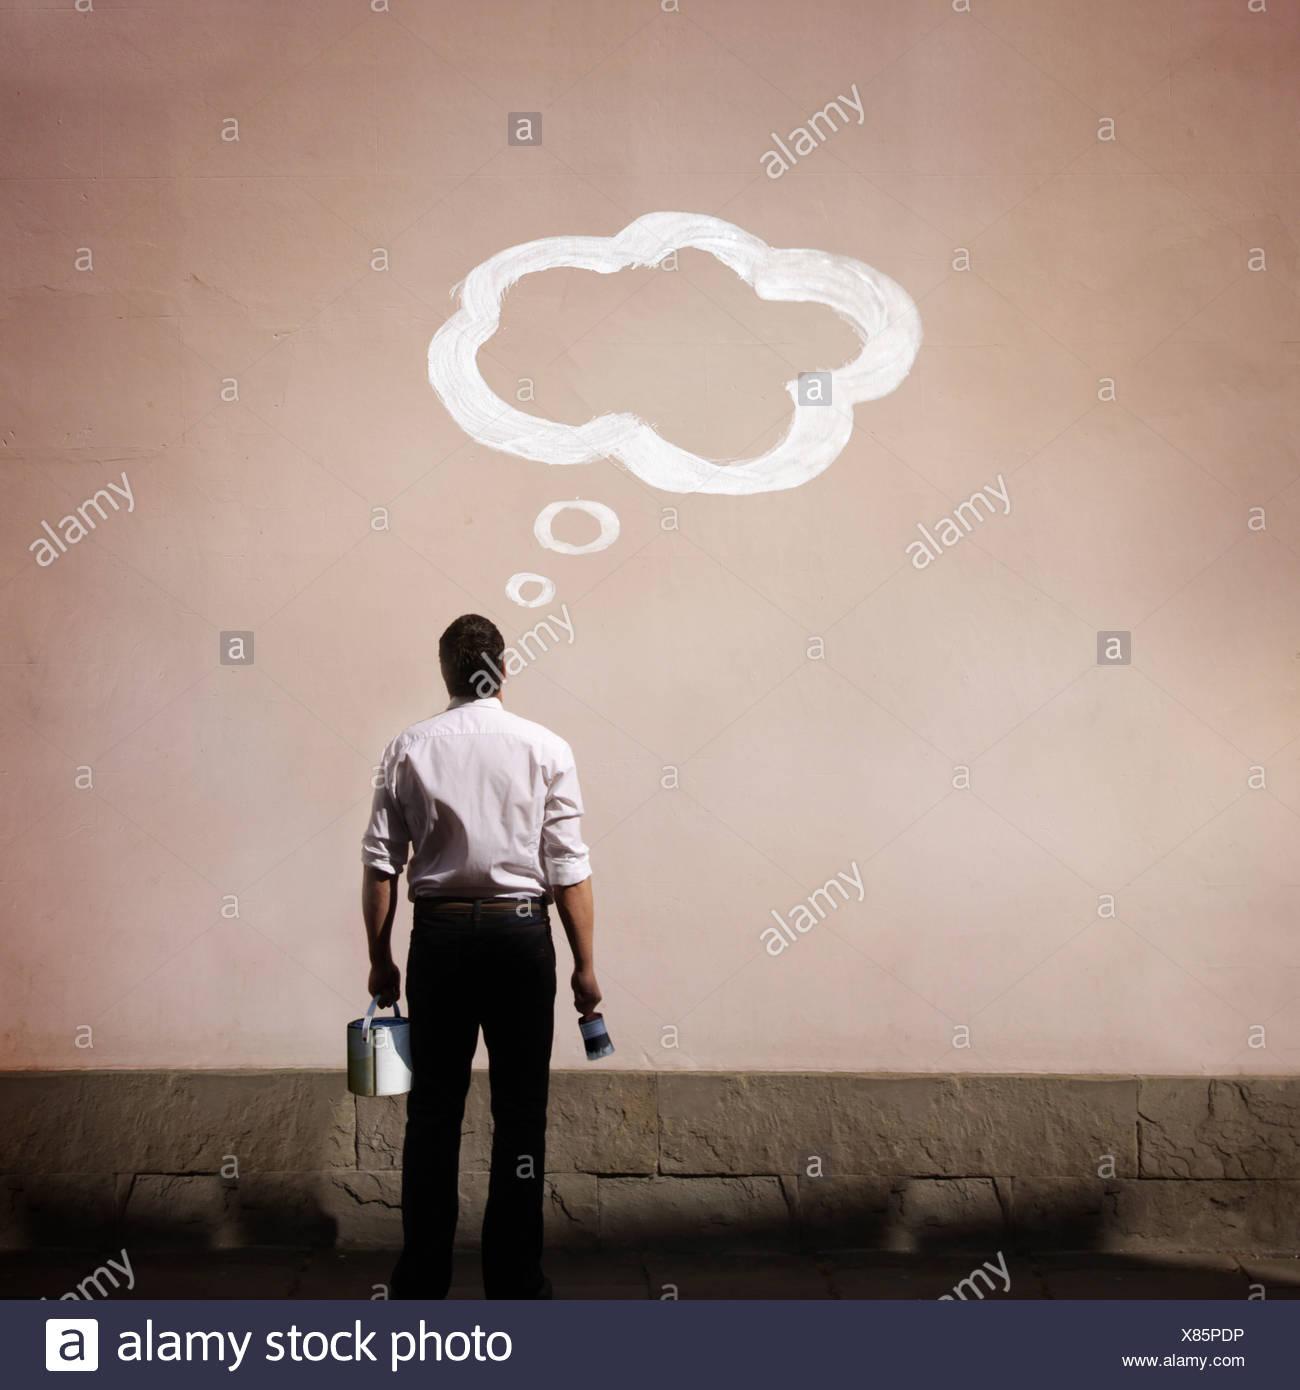 Hombre con burbuja de pensamiento pintado Imagen De Stock